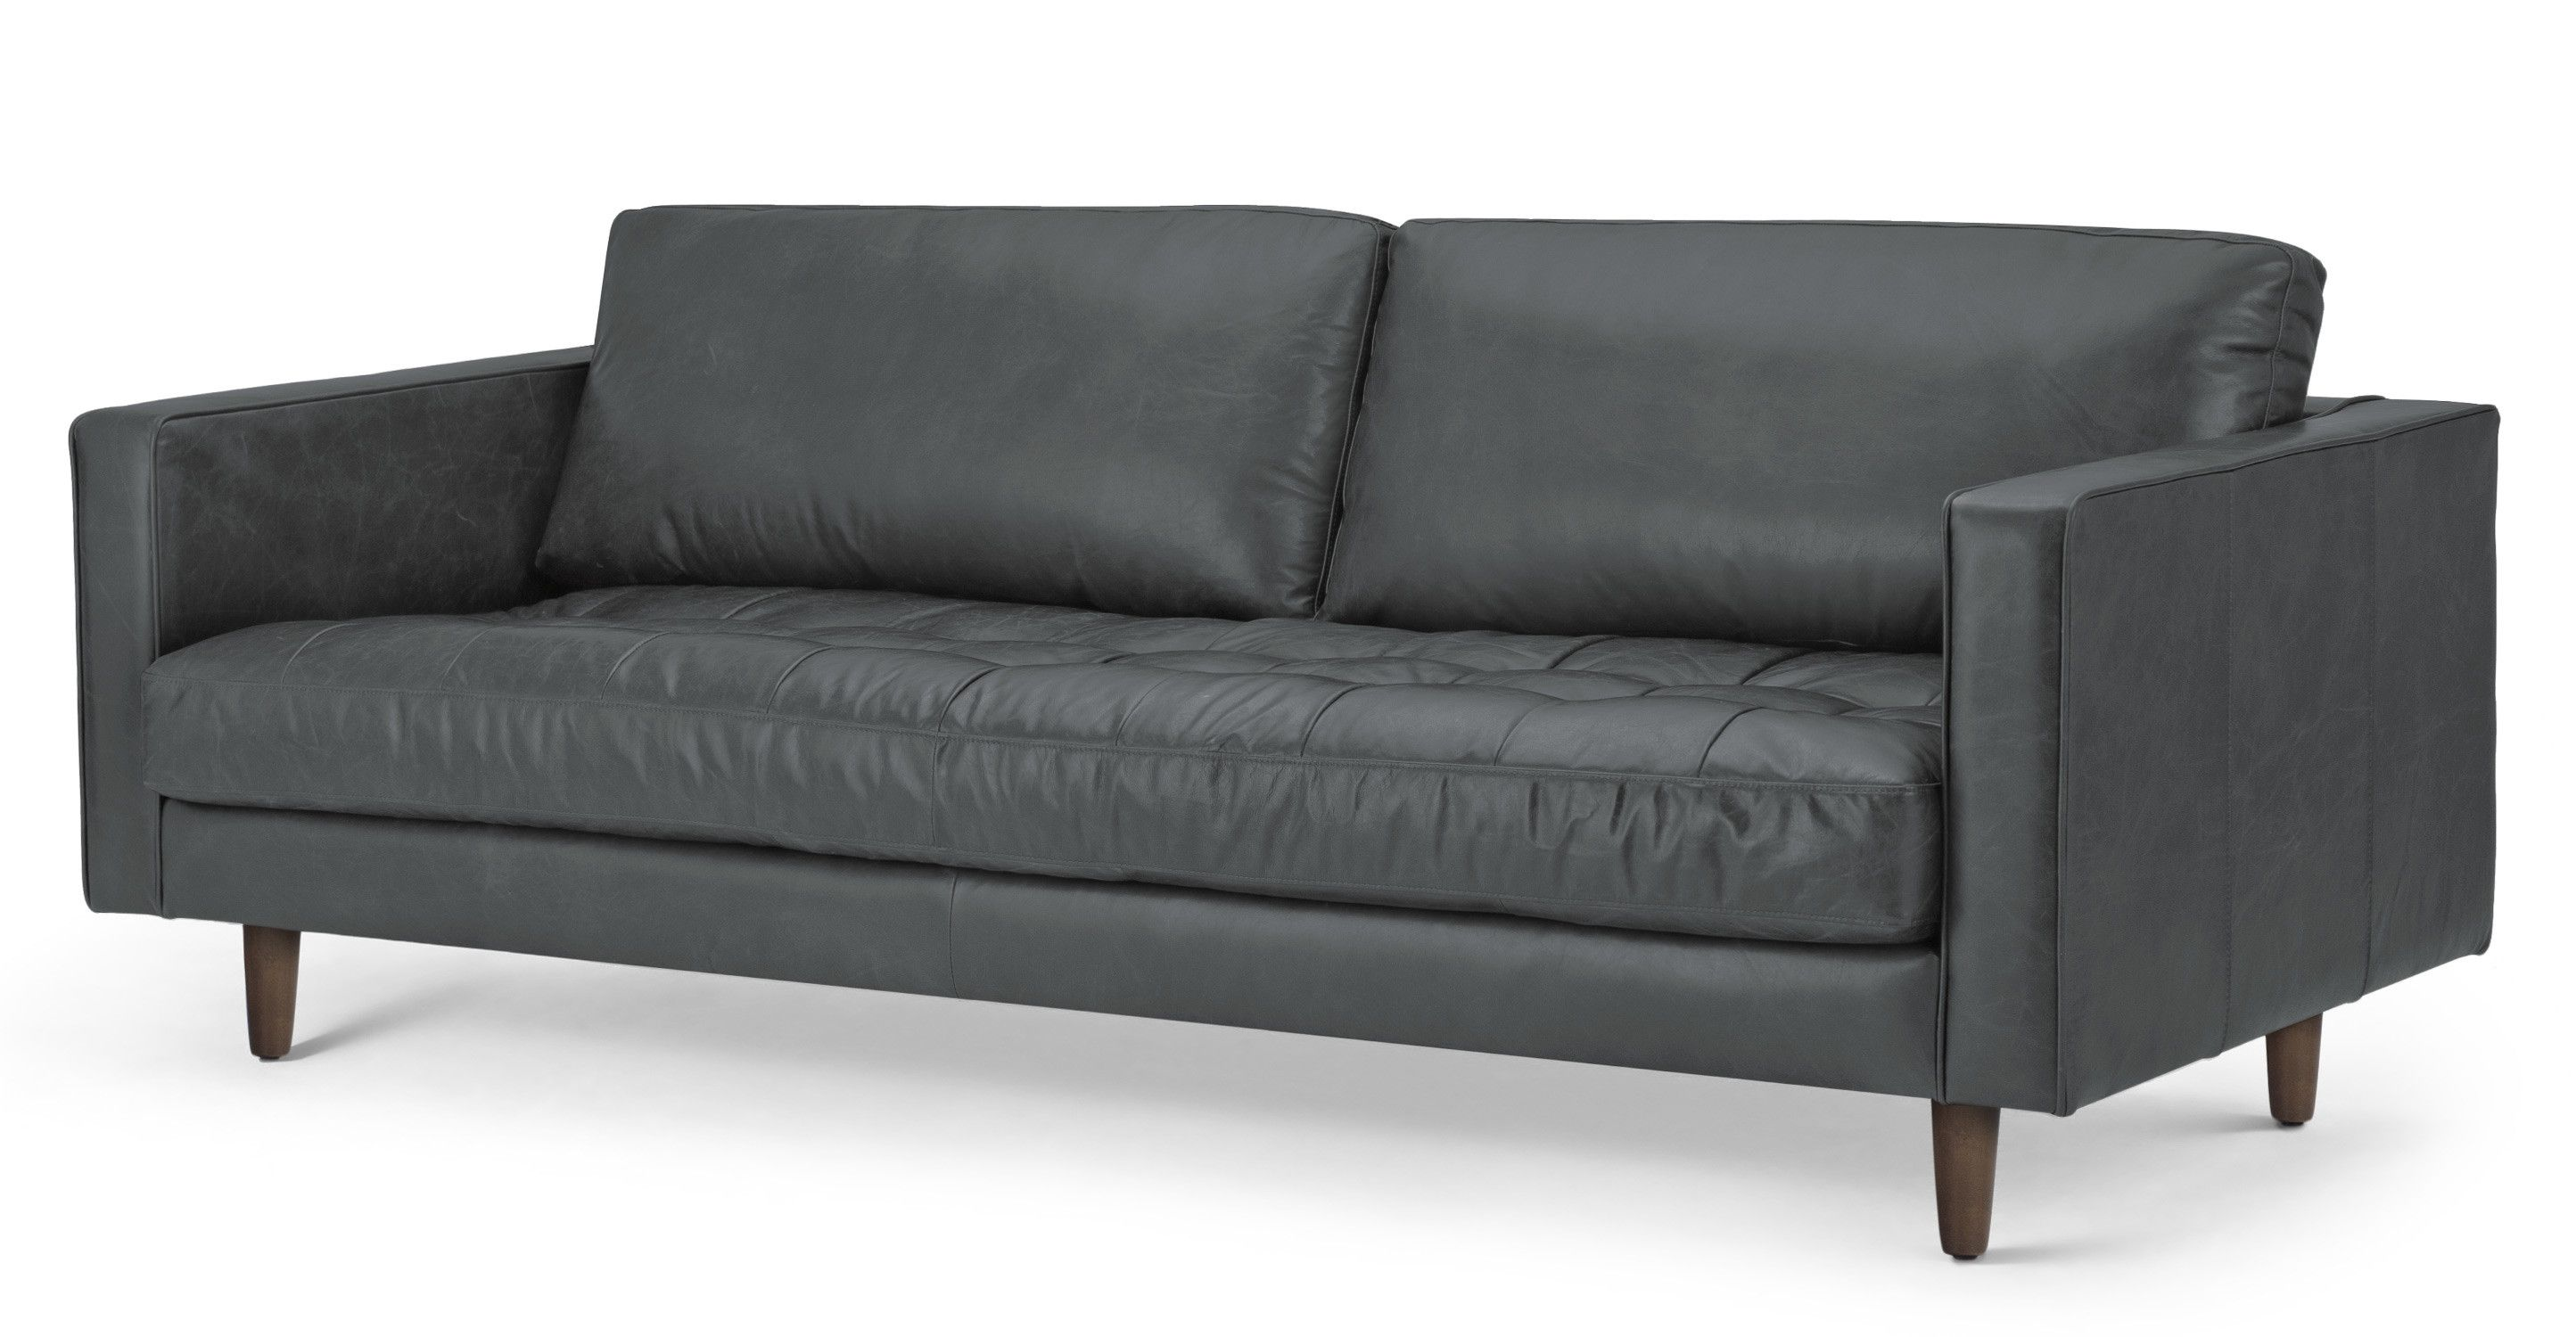 Scott 3 Sitzer Sofa Premium Leder In Grau 3 Seater Sofa Teal Living Rooms Sofa